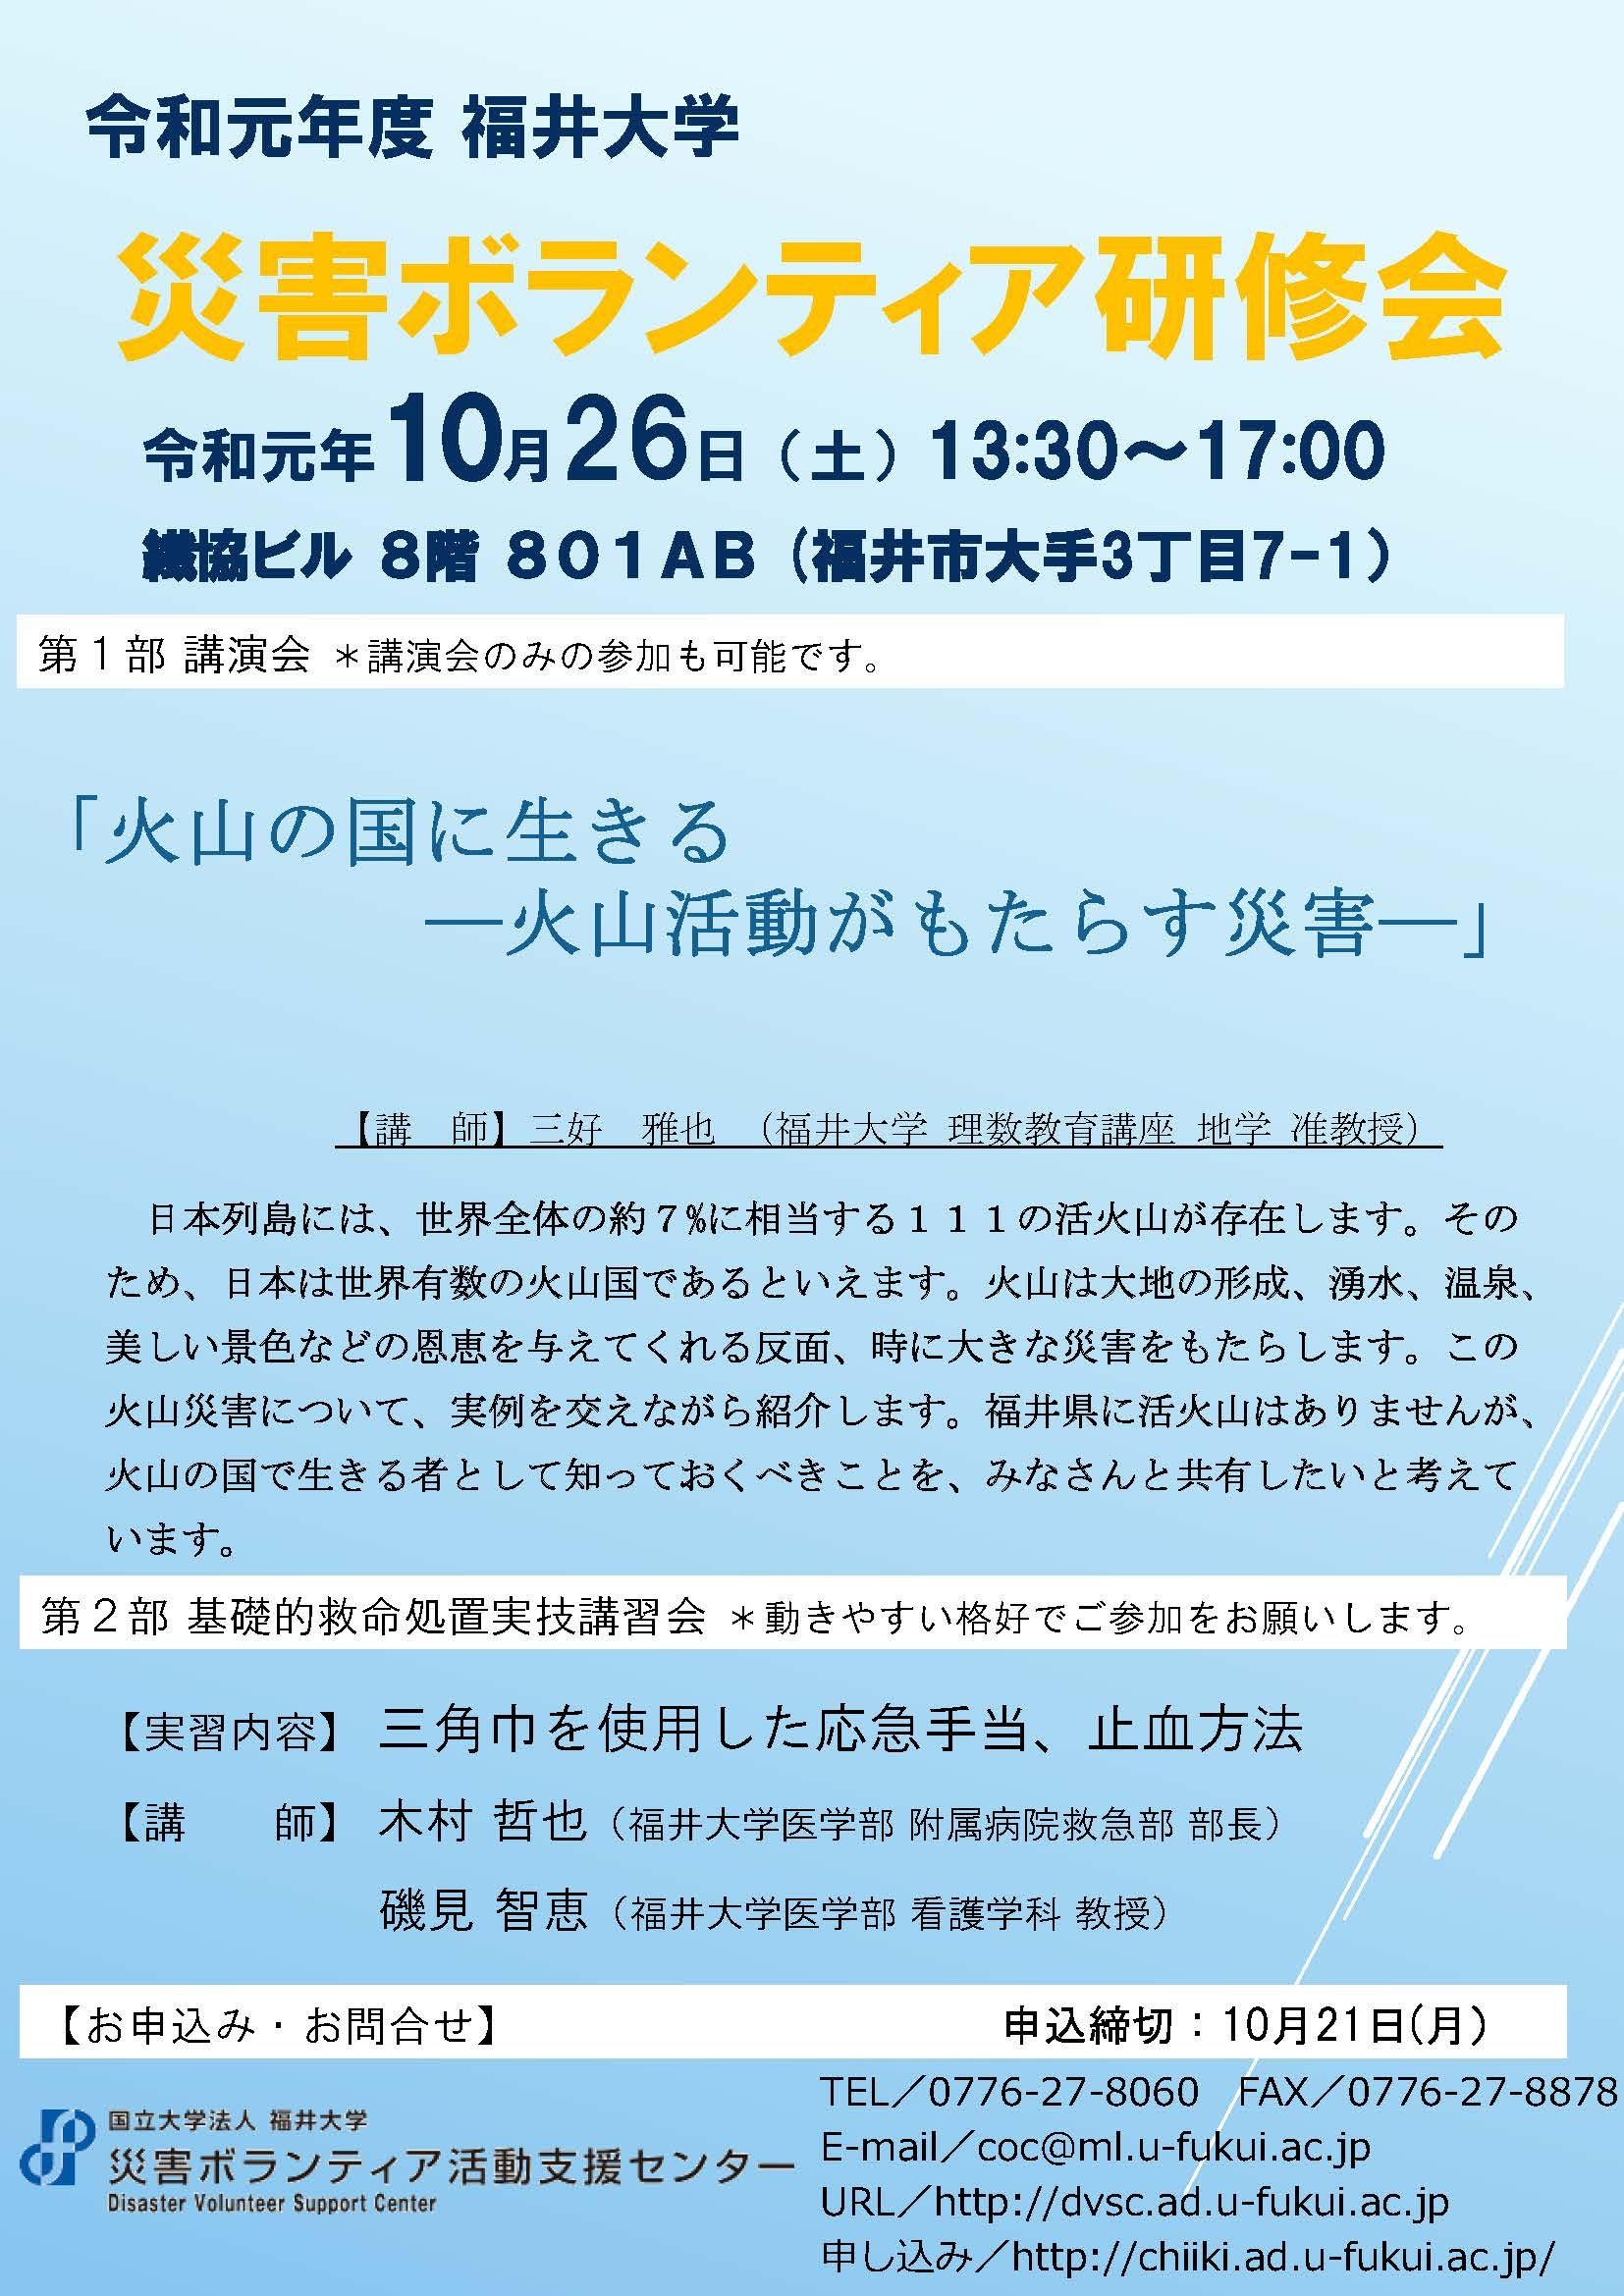 令和元年度 福井大学災害ボランティア研修会